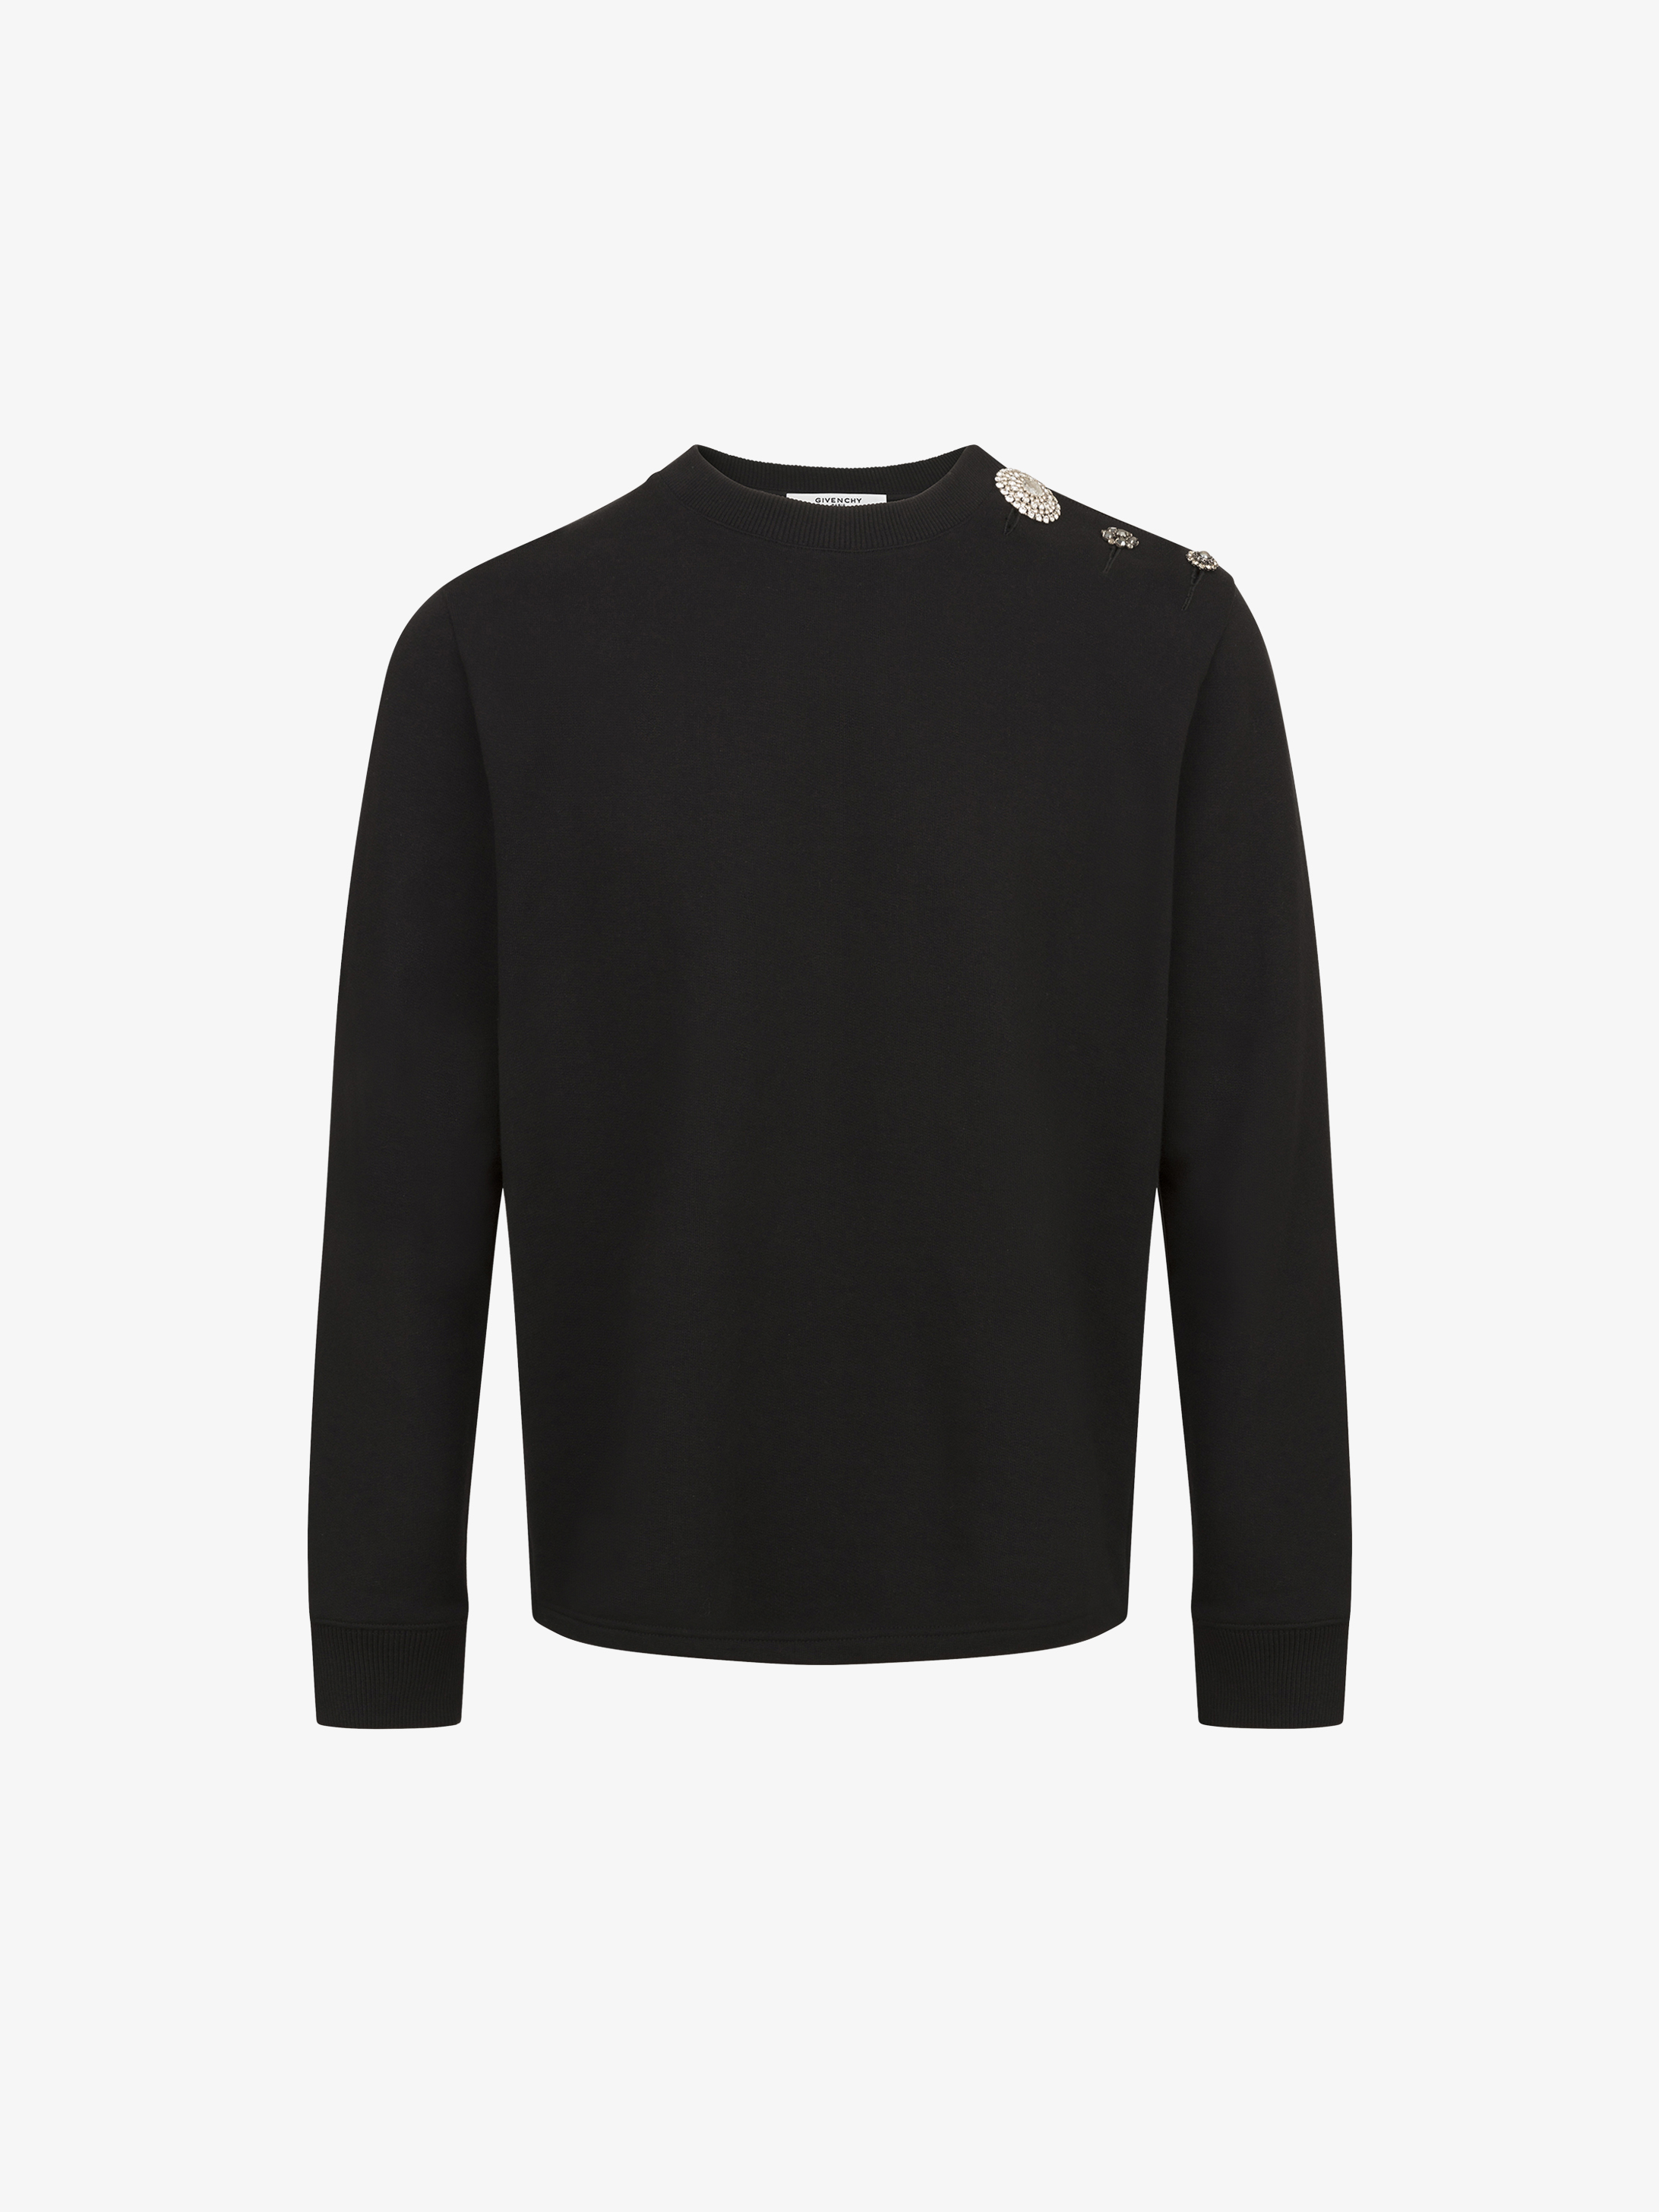 Jewelry buttons sweatshirt